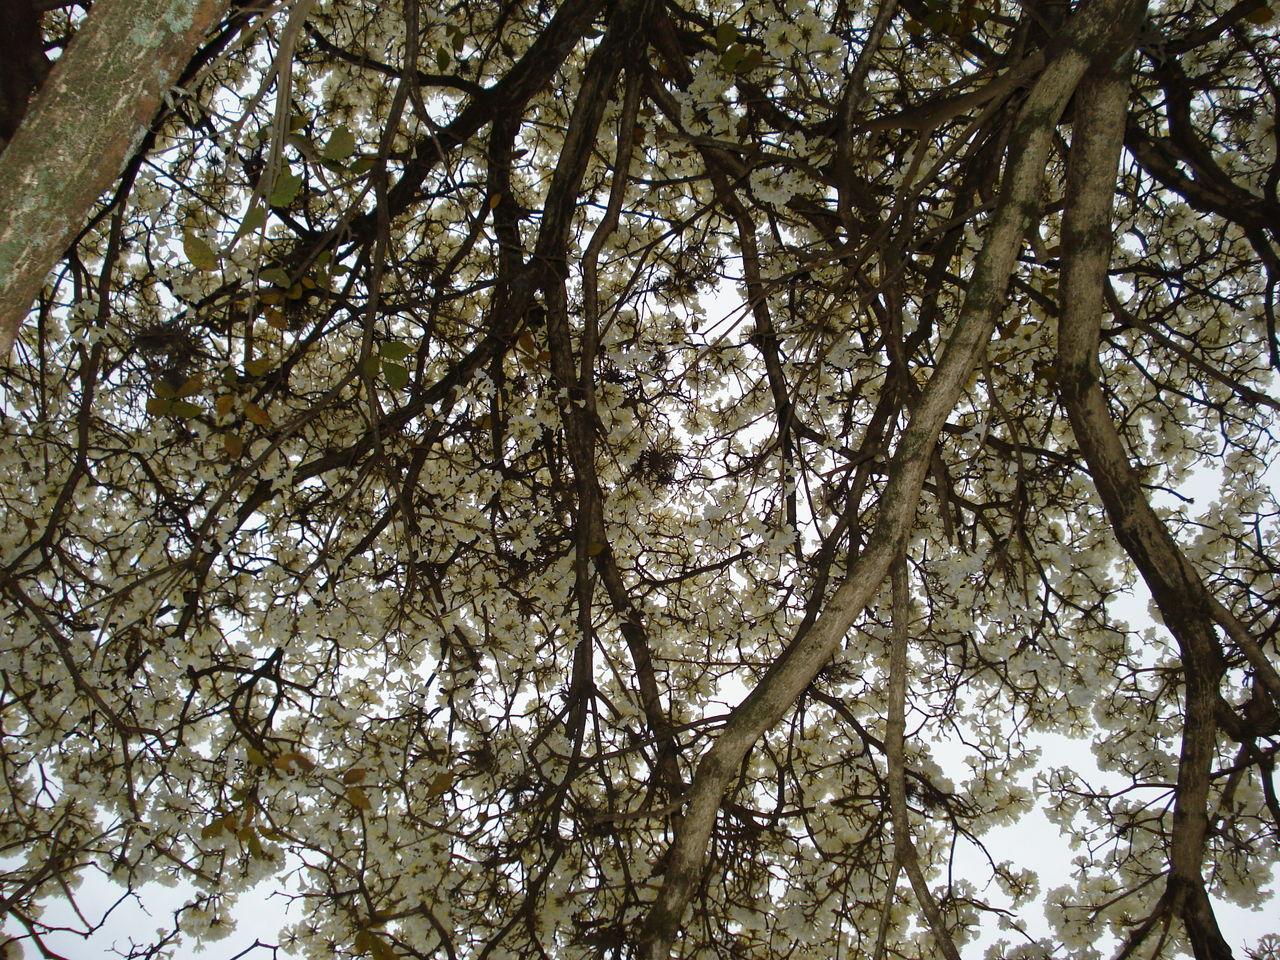 Bark Bignoniaceae Cerrado Ornamental Plant Tabebuia Roseoalba Beauty In Nature Biology Bloom Botanic Botany Branch Day Deciduous Ree Exuberant Flowering Flora Flower Growth Ipê Branco Nature No People Outdoors Tree Vegetation White Trumpet Tree